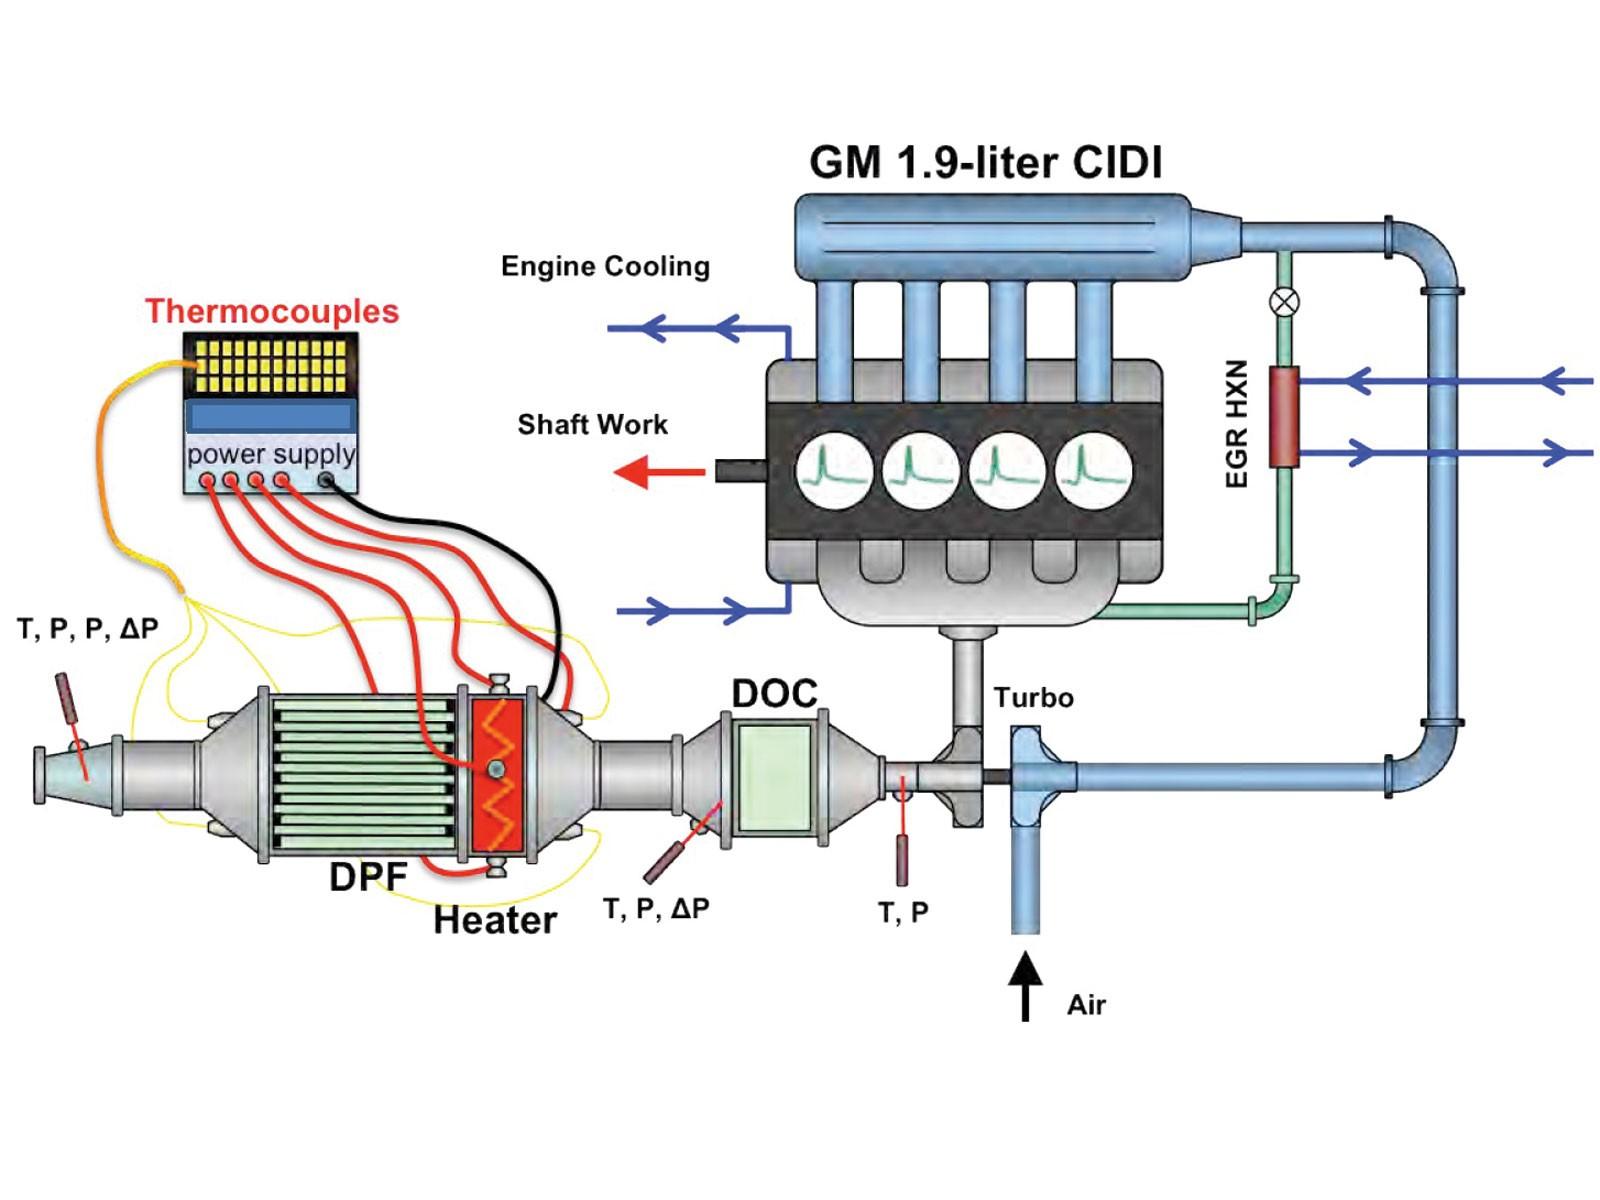 Engineering Block Diagram Electric Generator Diagram Eee Electronics Of Engineering Block Diagram